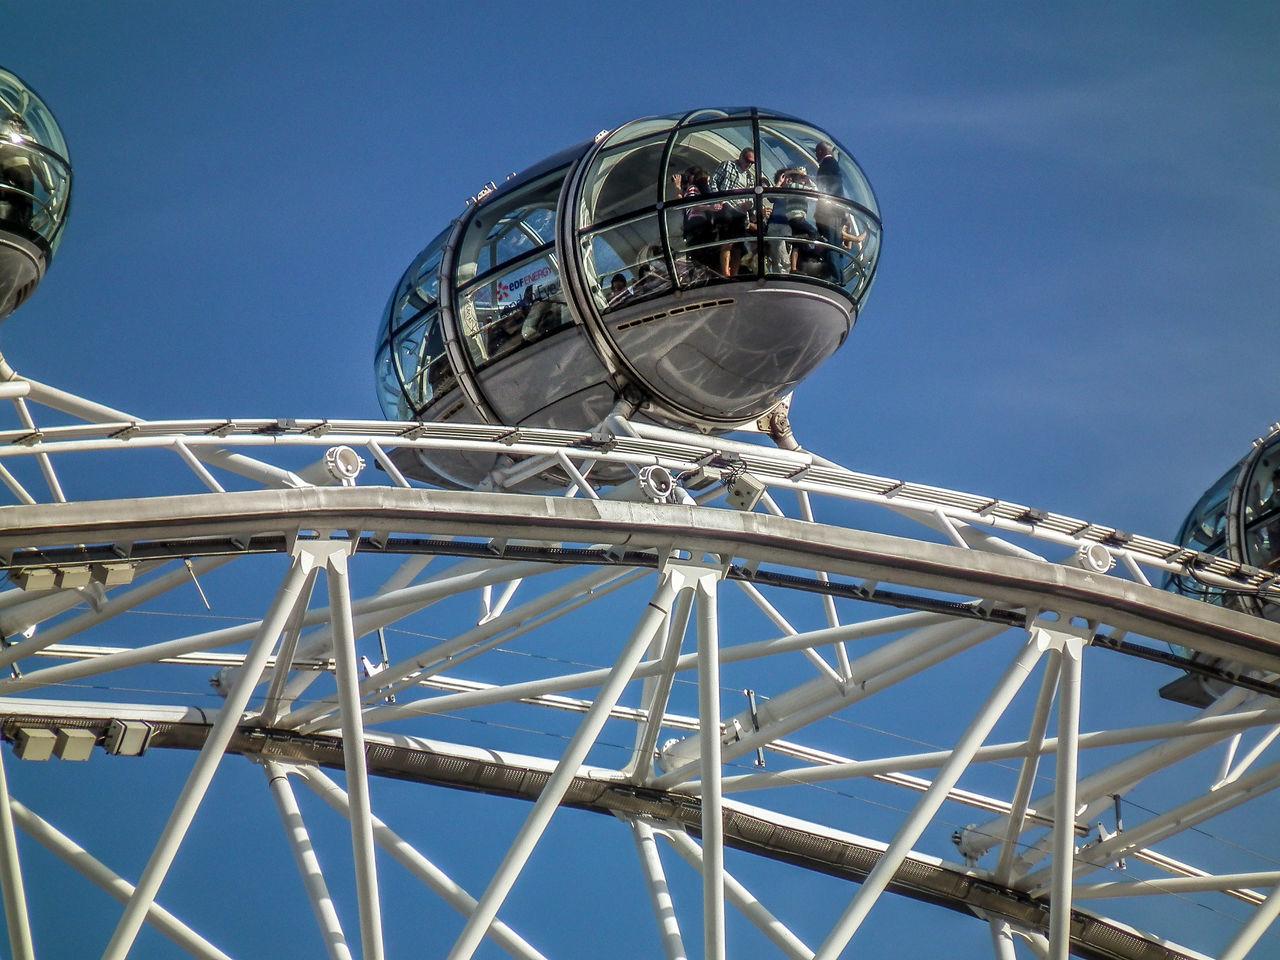 Amusement Park Amusement Park Ride Arts Culture And Entertainment Big Wheel Clear Sky Day England Gran Bretagna Great Britain Großbritannien Inghilterra London London Eye Londra Low Angle View No People Outdoors Sky